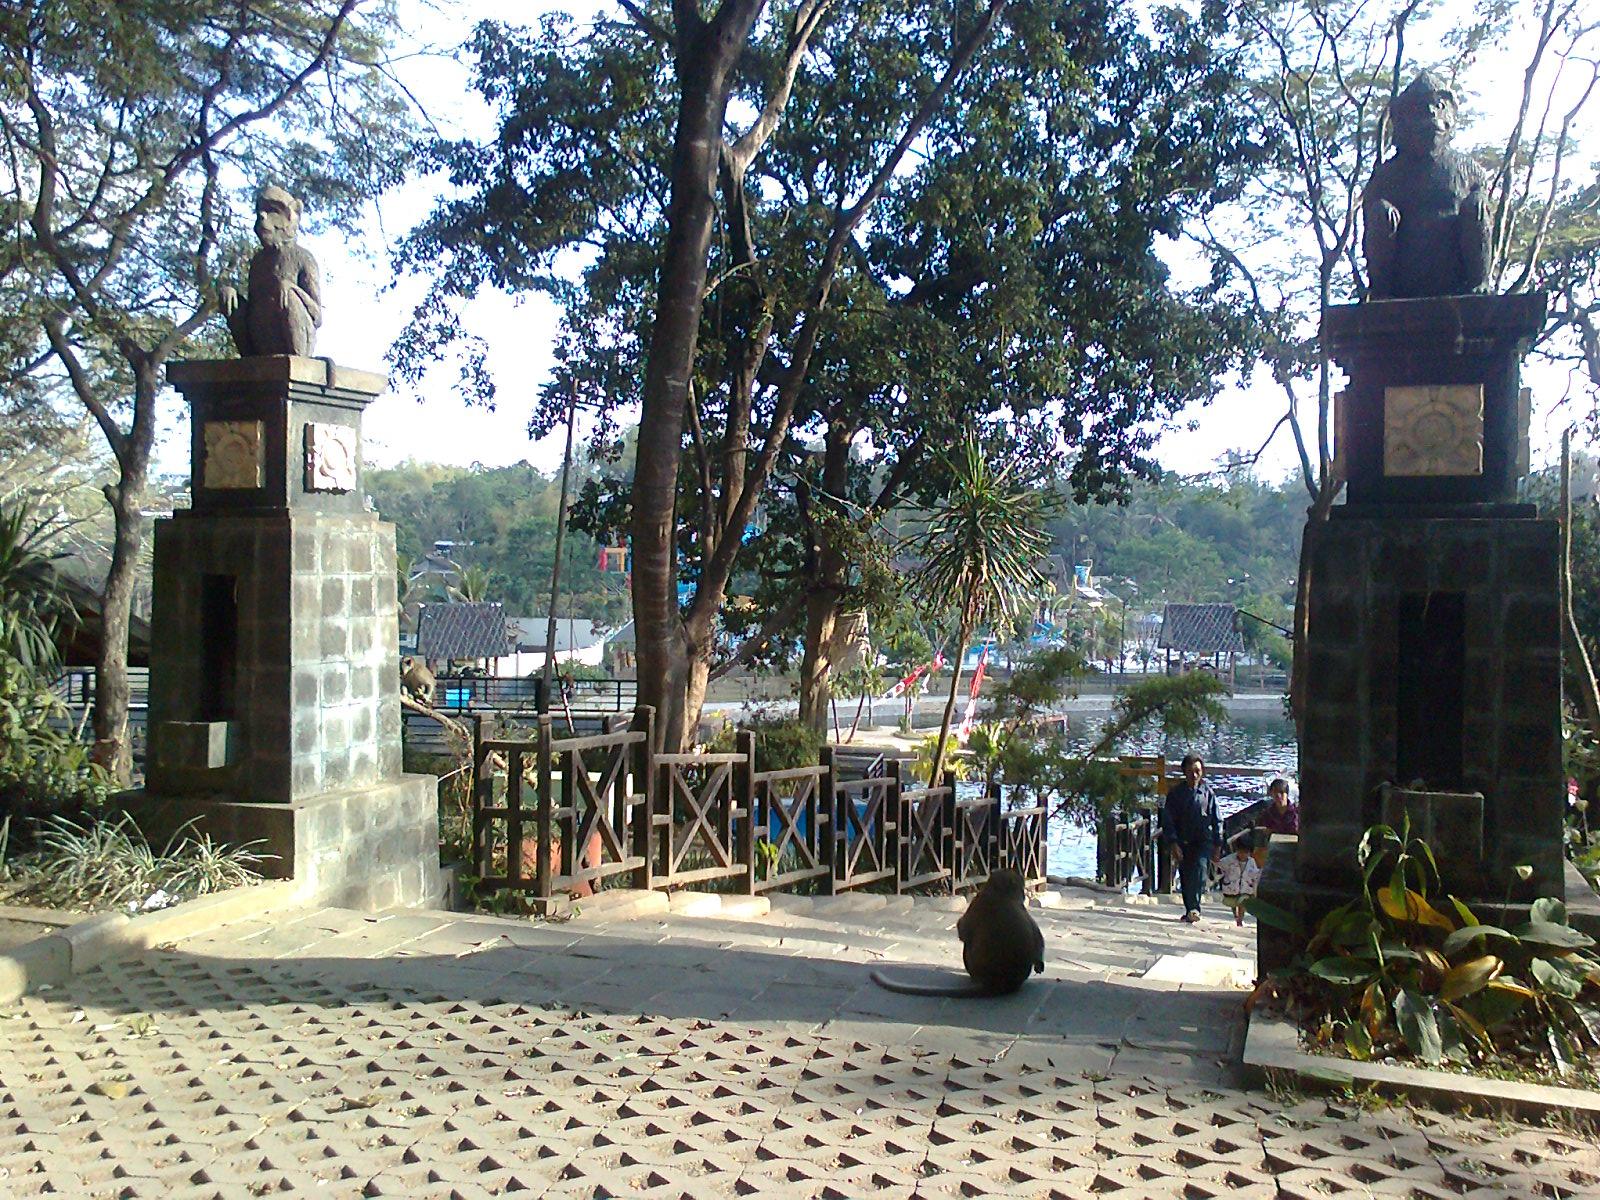 Lokasi Taman Wisata Air Wendit Malang Jawa Timur Tempat Kota